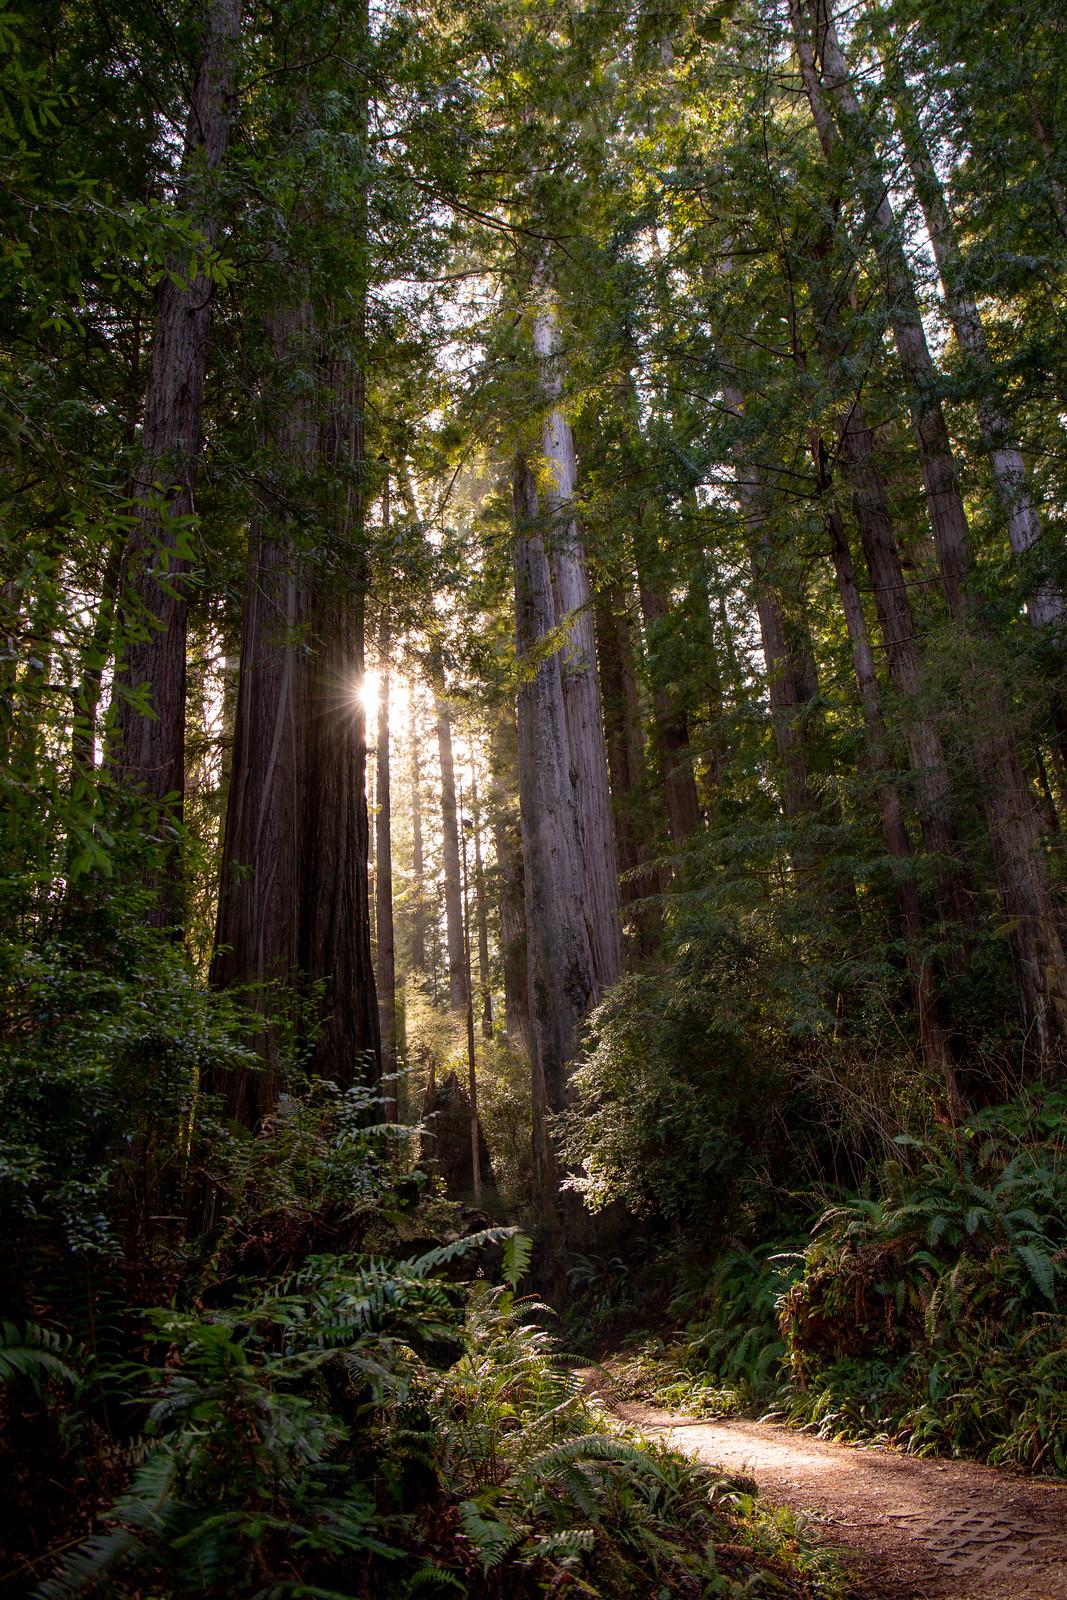 03.16. Prairie Creek Redwoods State Park